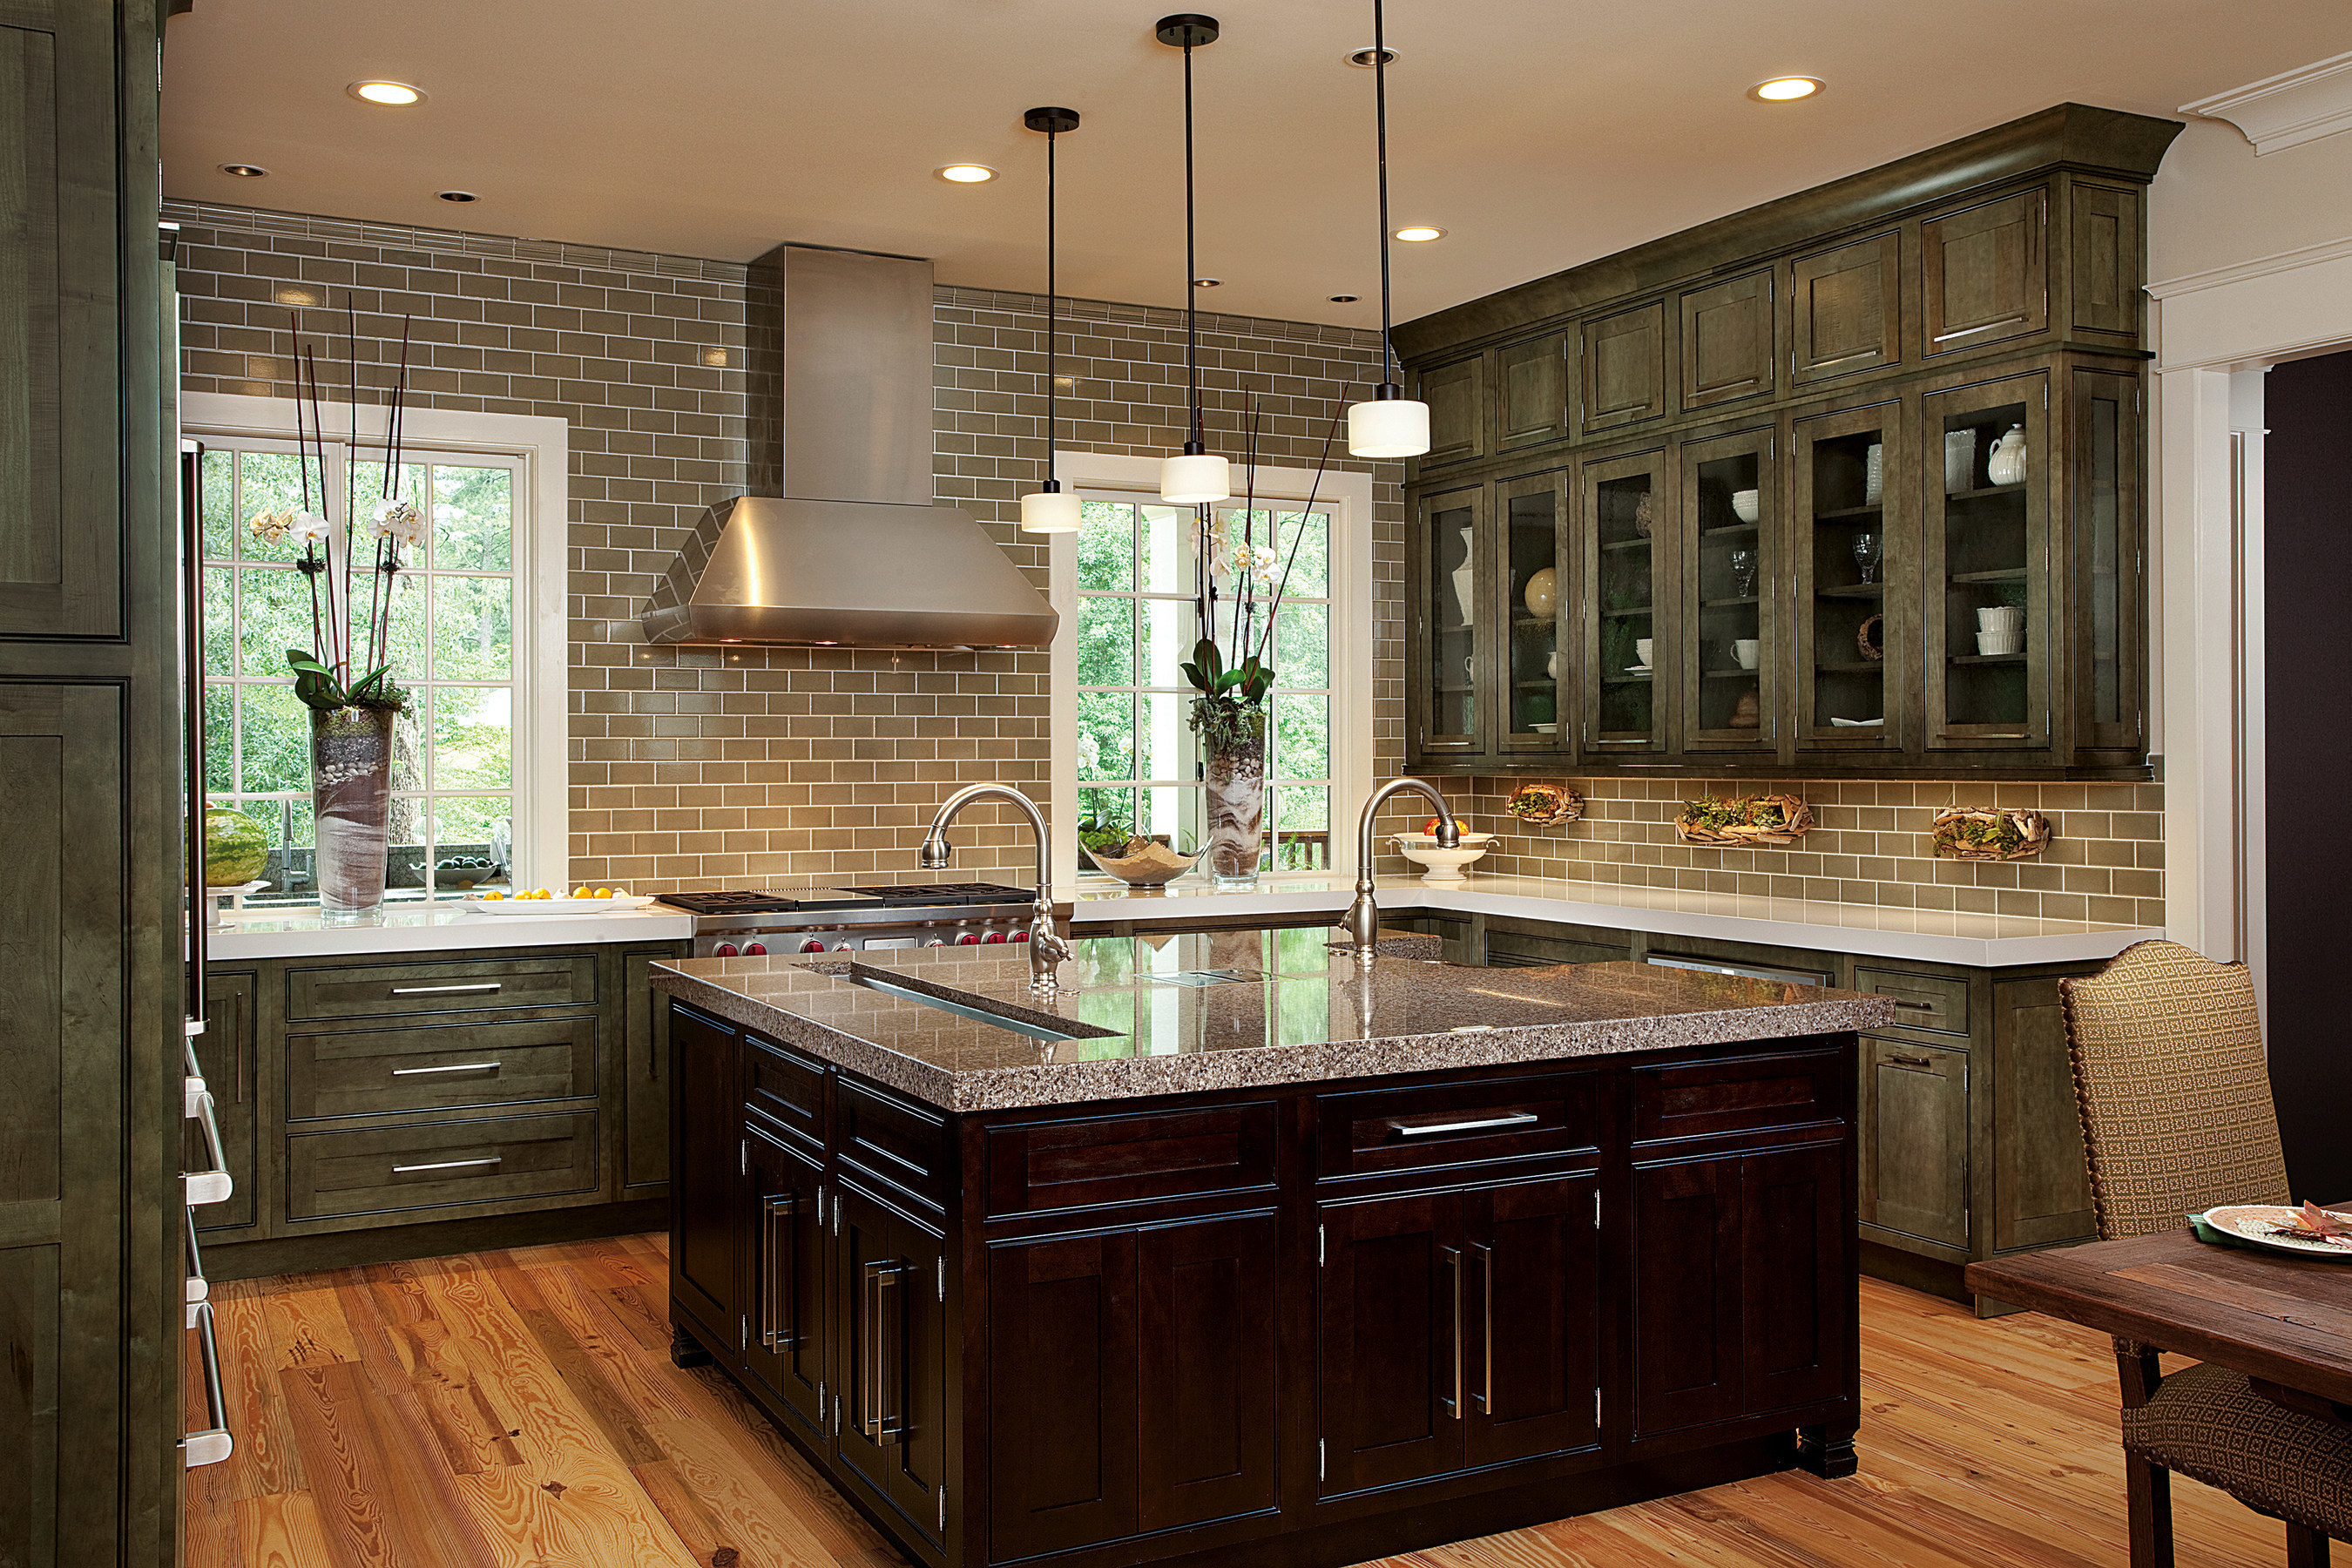 Wellborn Cabinet, Inc. Introduces Inset Door Styles To Premier